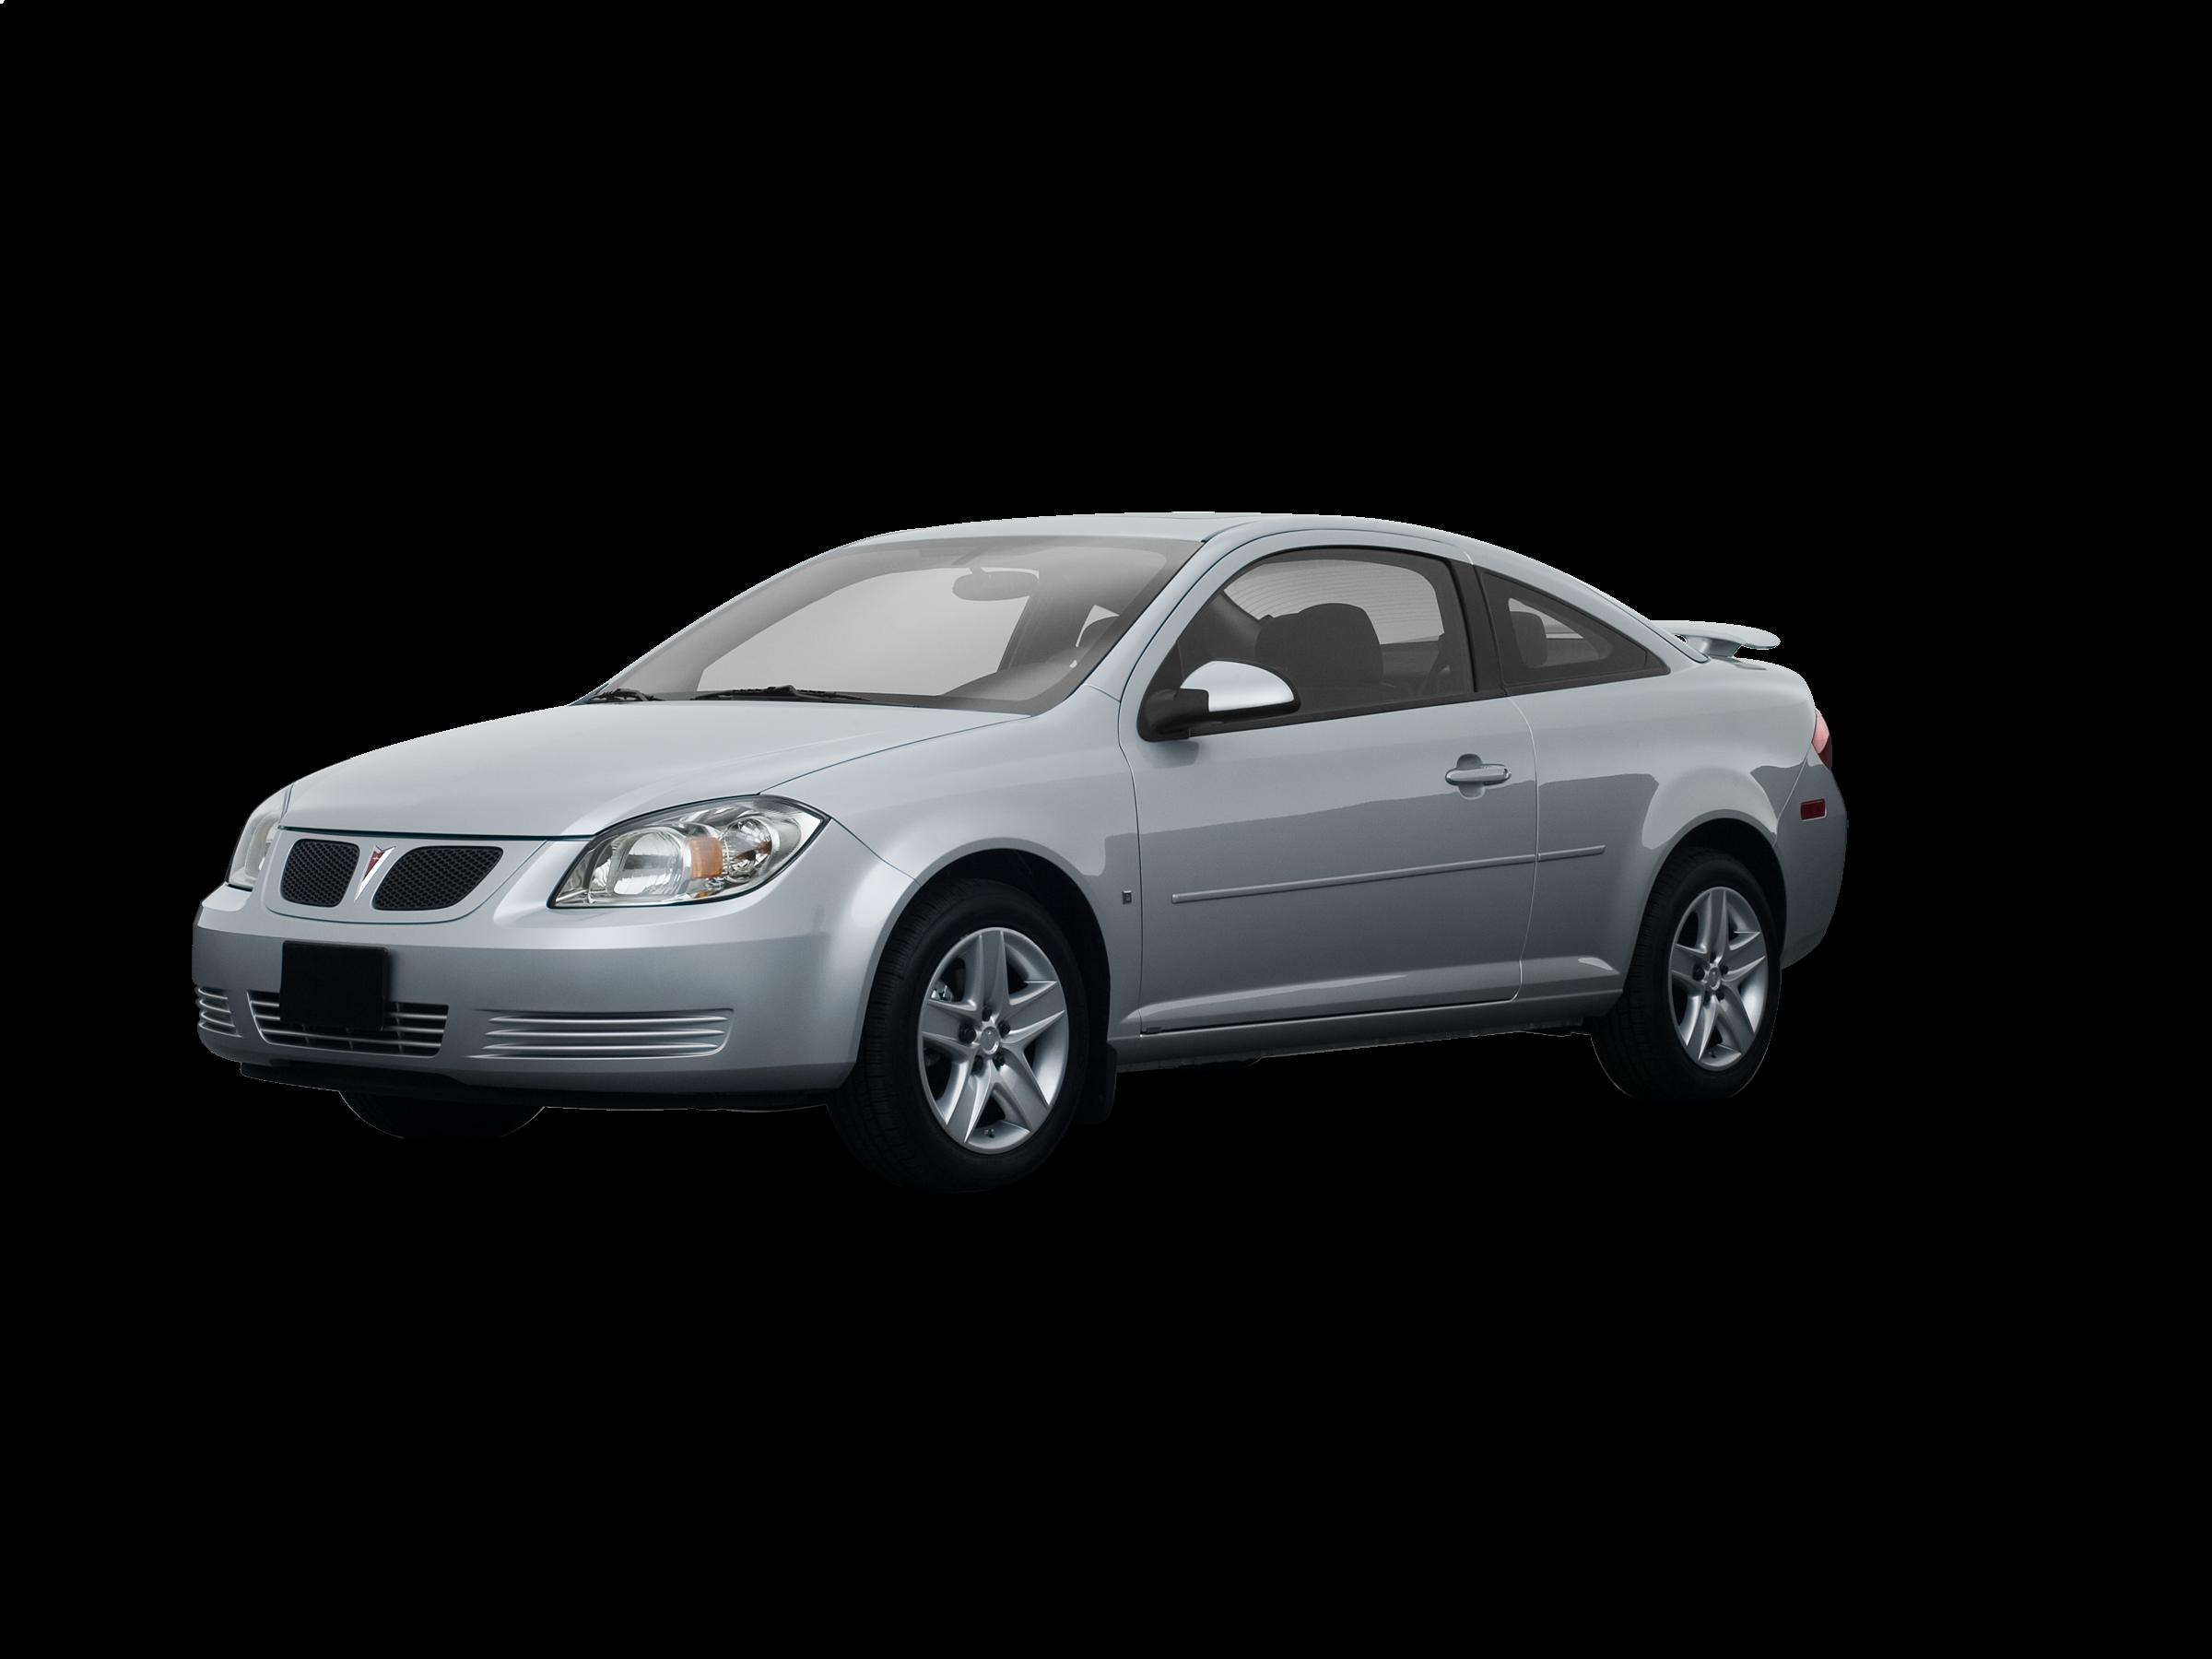 2008 Pontiac G5 Values Cars For Sale Kelley Blue Book